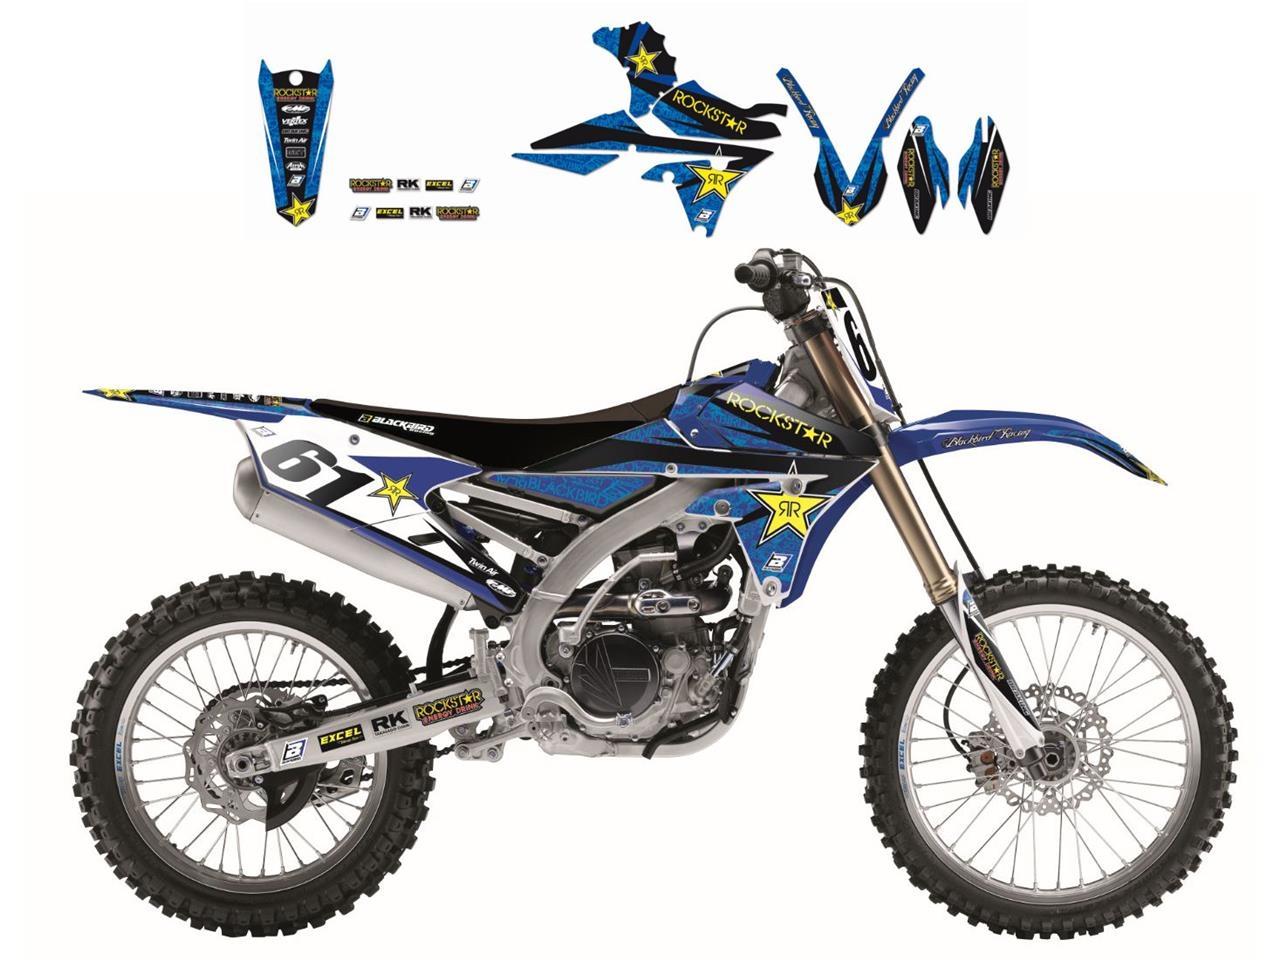 Kit déco Blackbird Rockstar Energy Yamaha 250 YZ 02-14